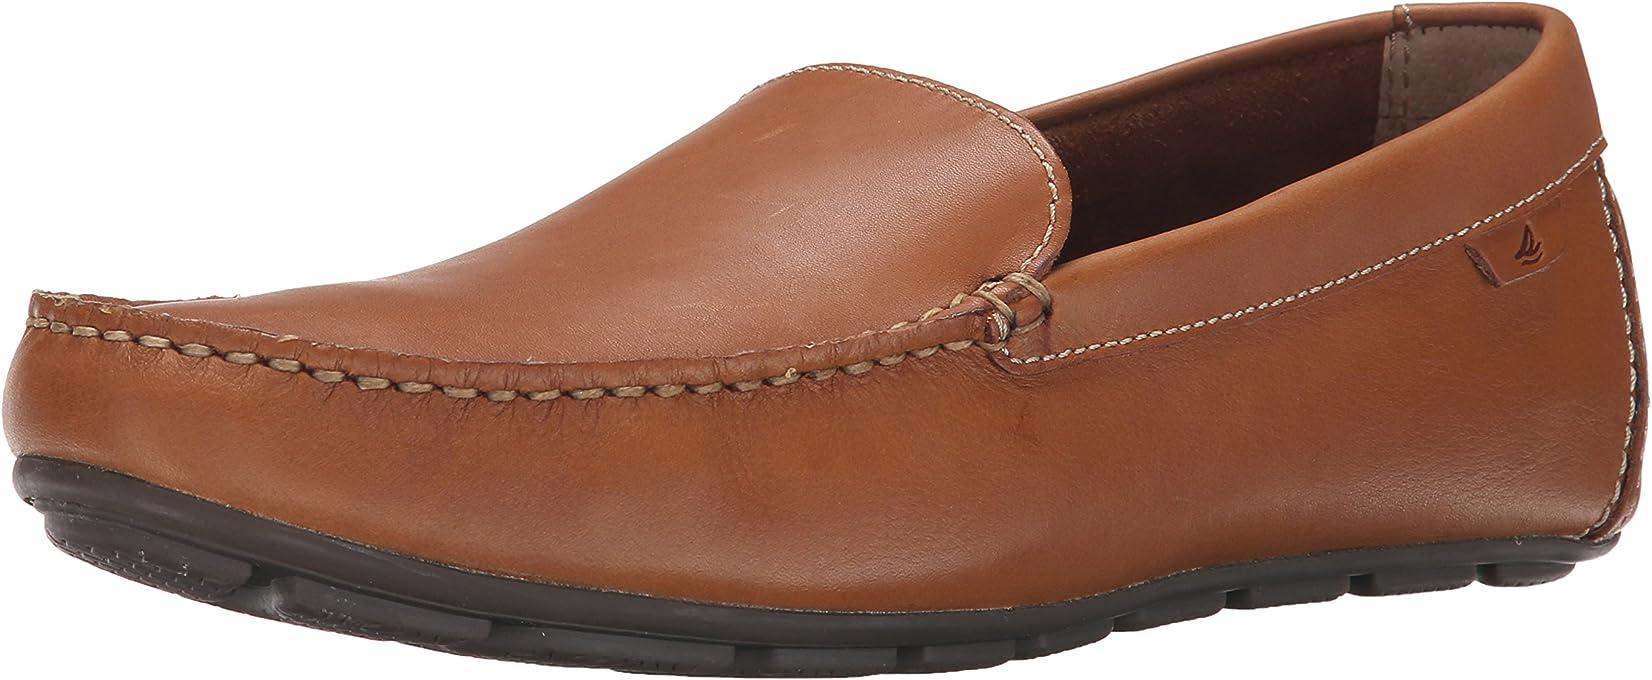 Sperry Wave Driver Venetian Men's Loafer Flats